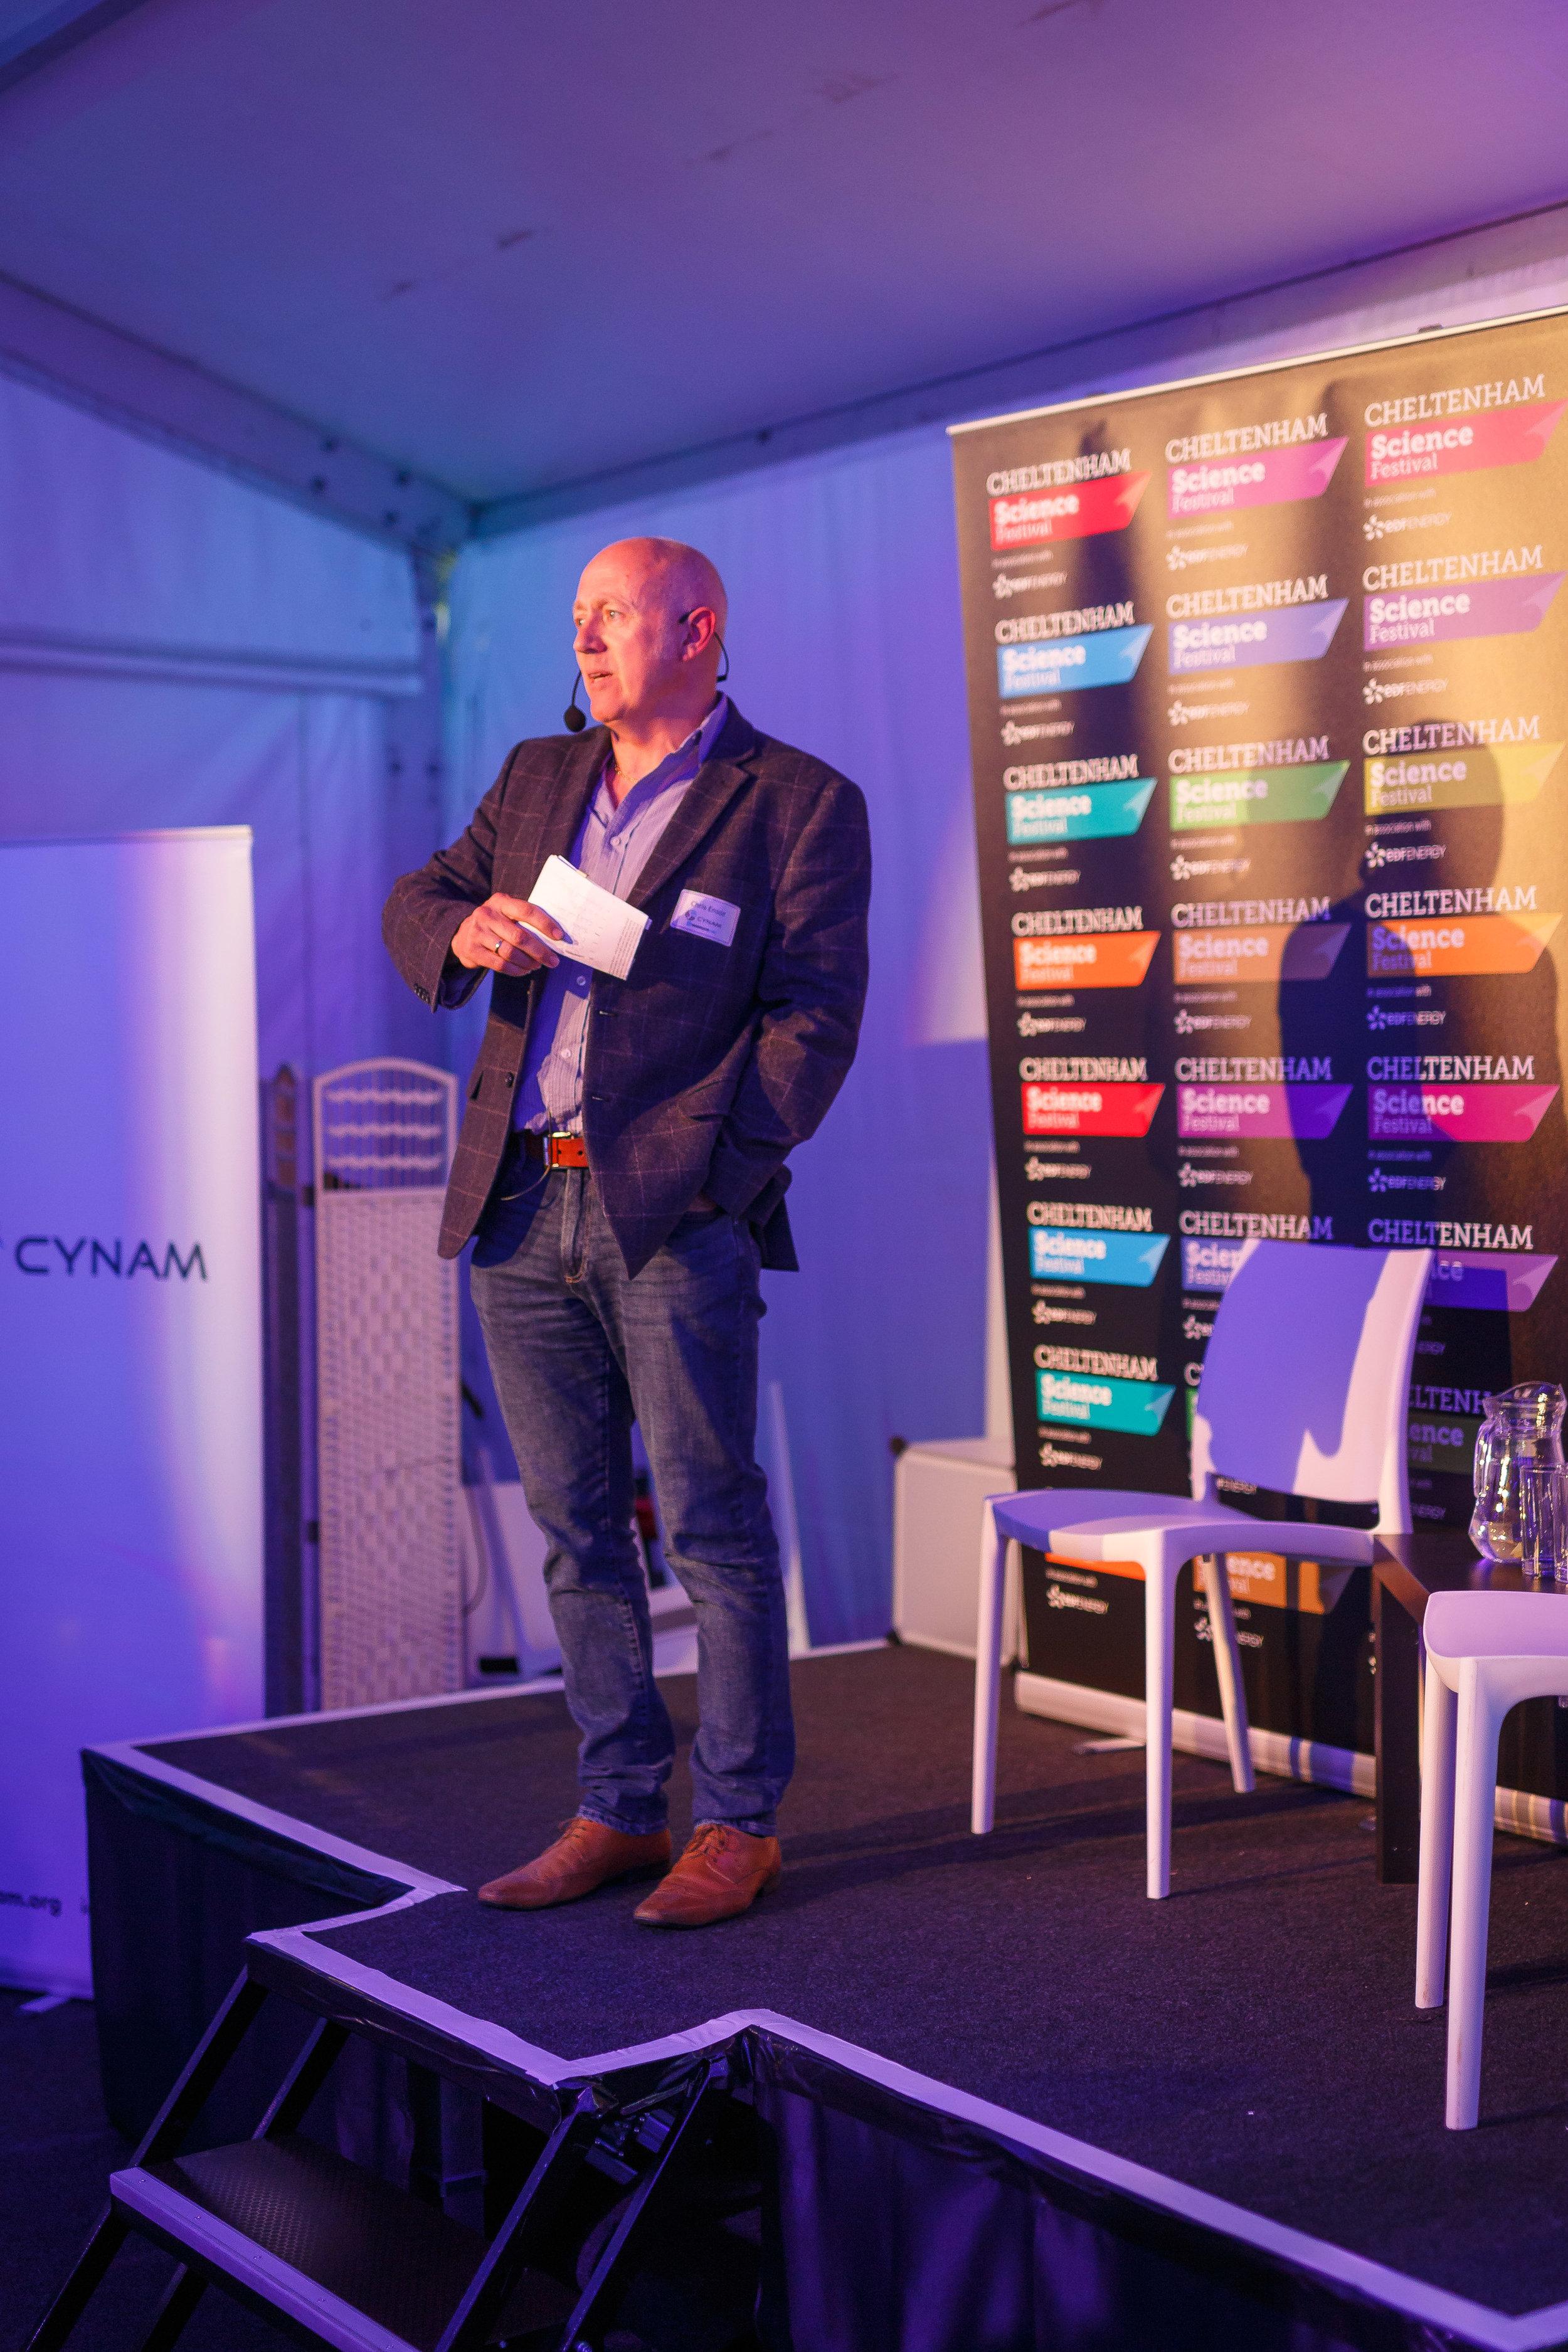 2018.06.08-CyNam-Cheltenham-Science-Festival-iPlus-0034.jpg